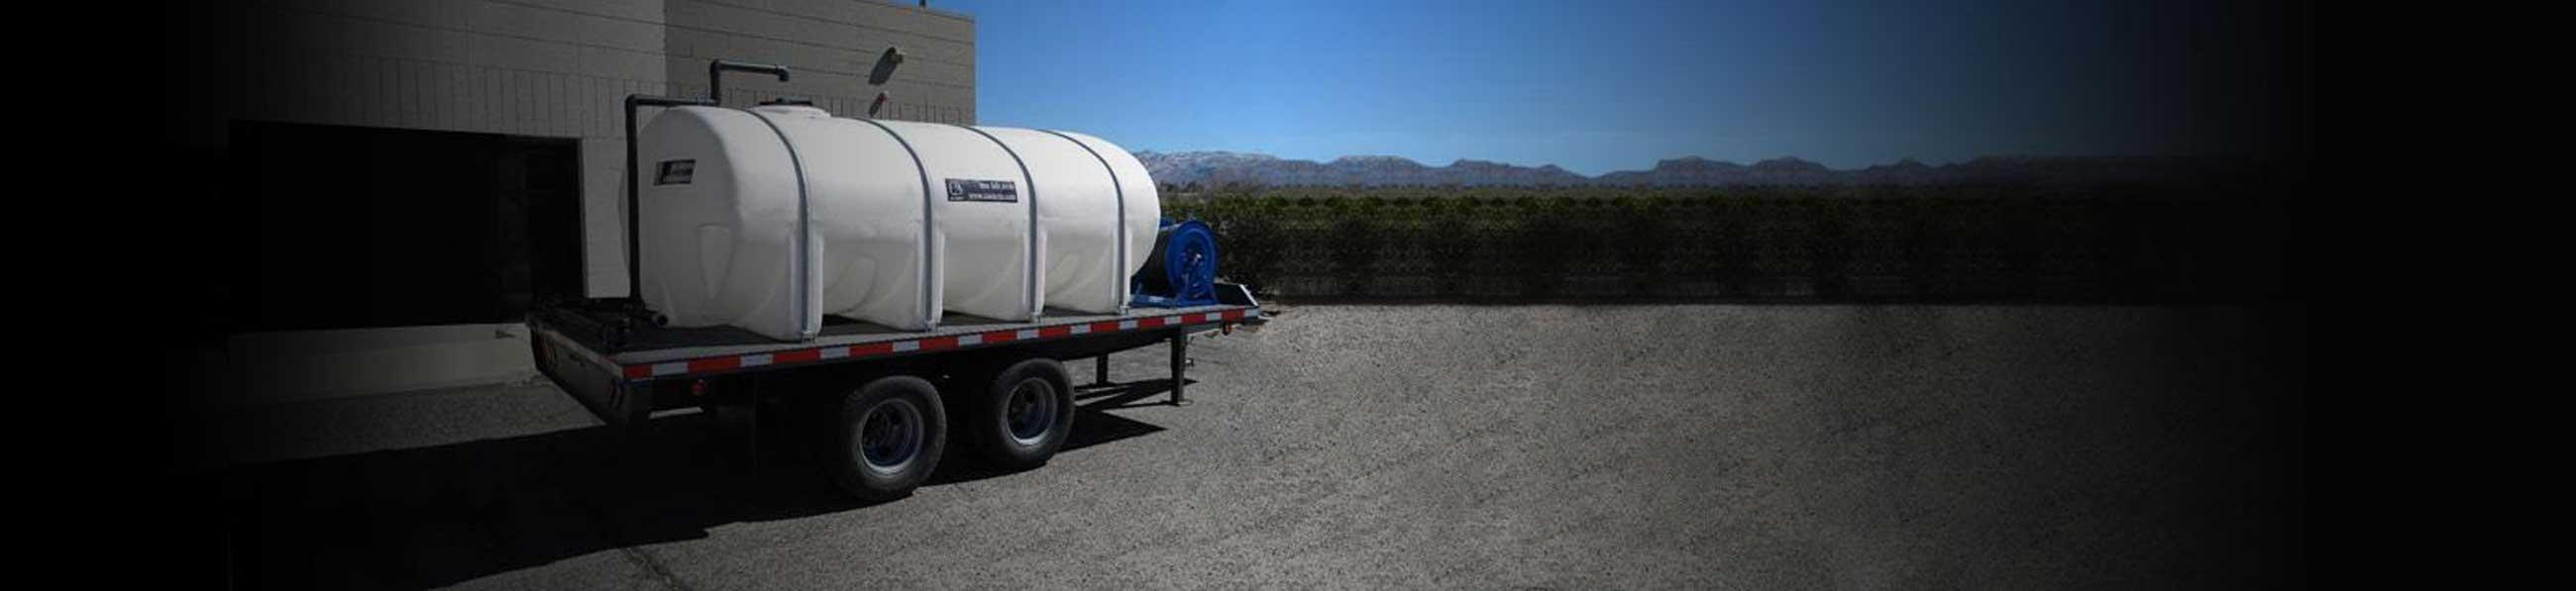 Water Trailers Tucson | C&I Equipment